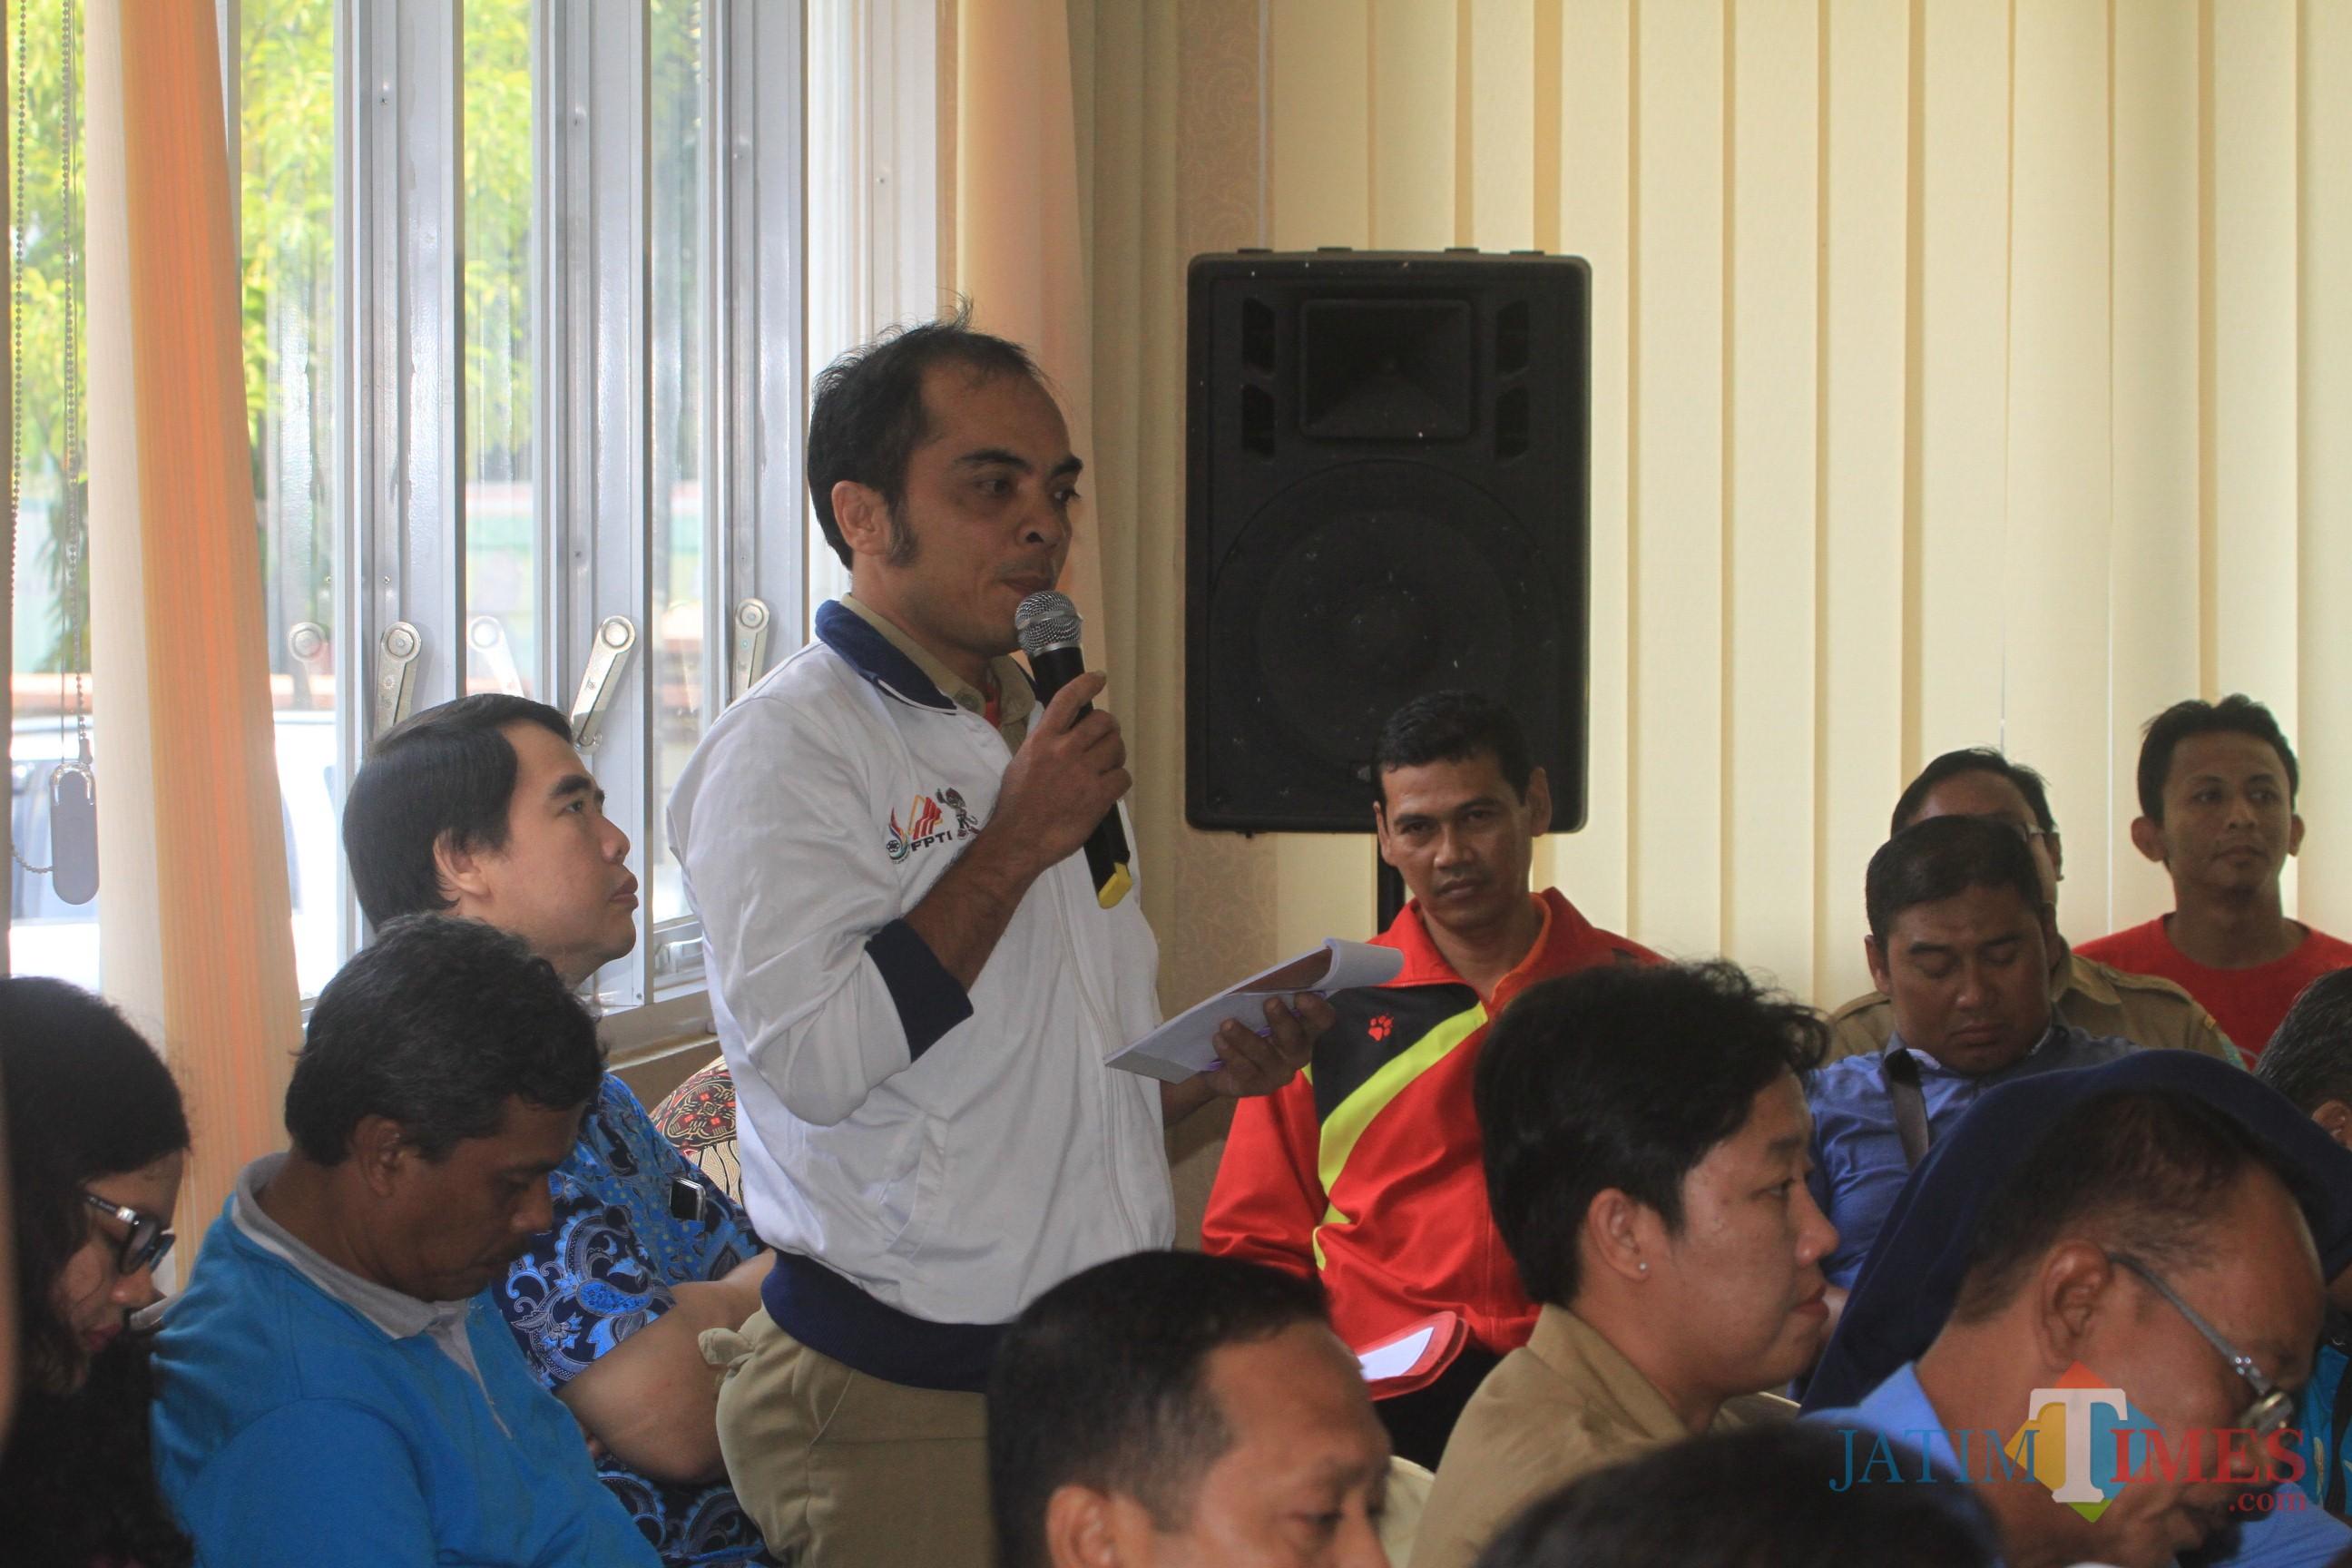 Iwan Rosyidi, pelatih climbing internasional saat curhat ke komisi 3 DPRD Kota Probolinggo (Agus Salam/Jatim TIMES)